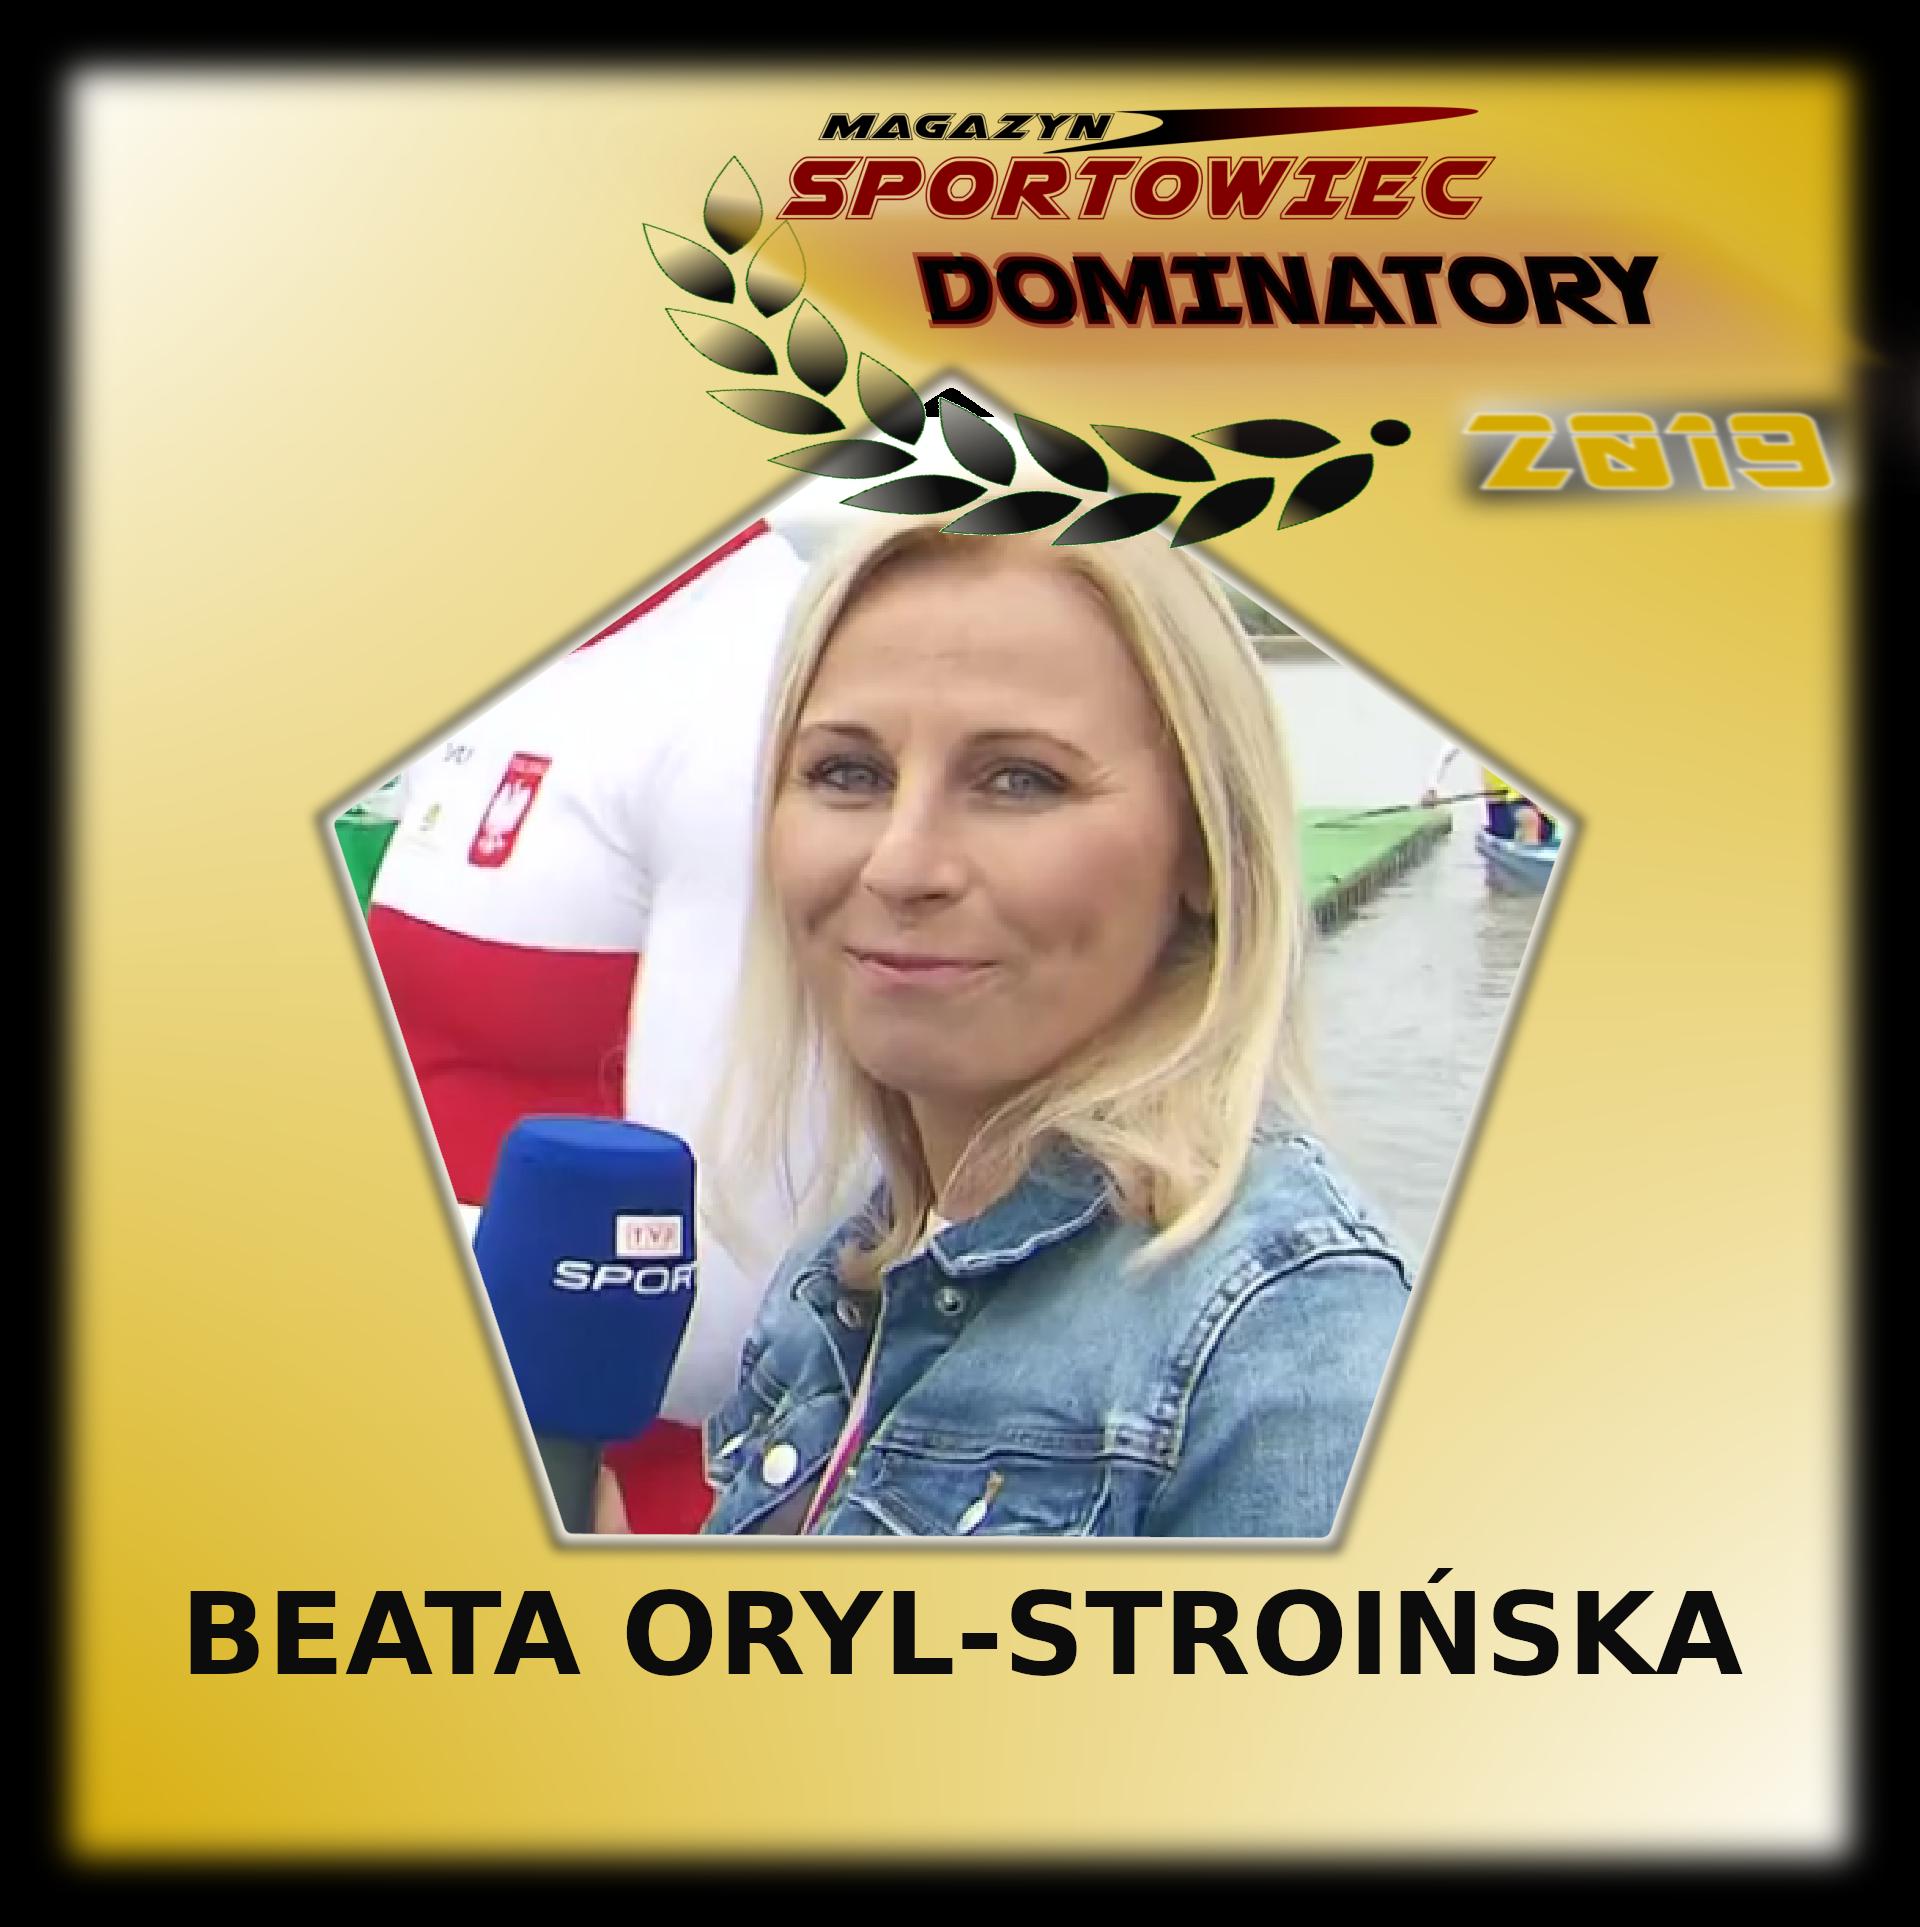 Beata Oryl-Stroińska